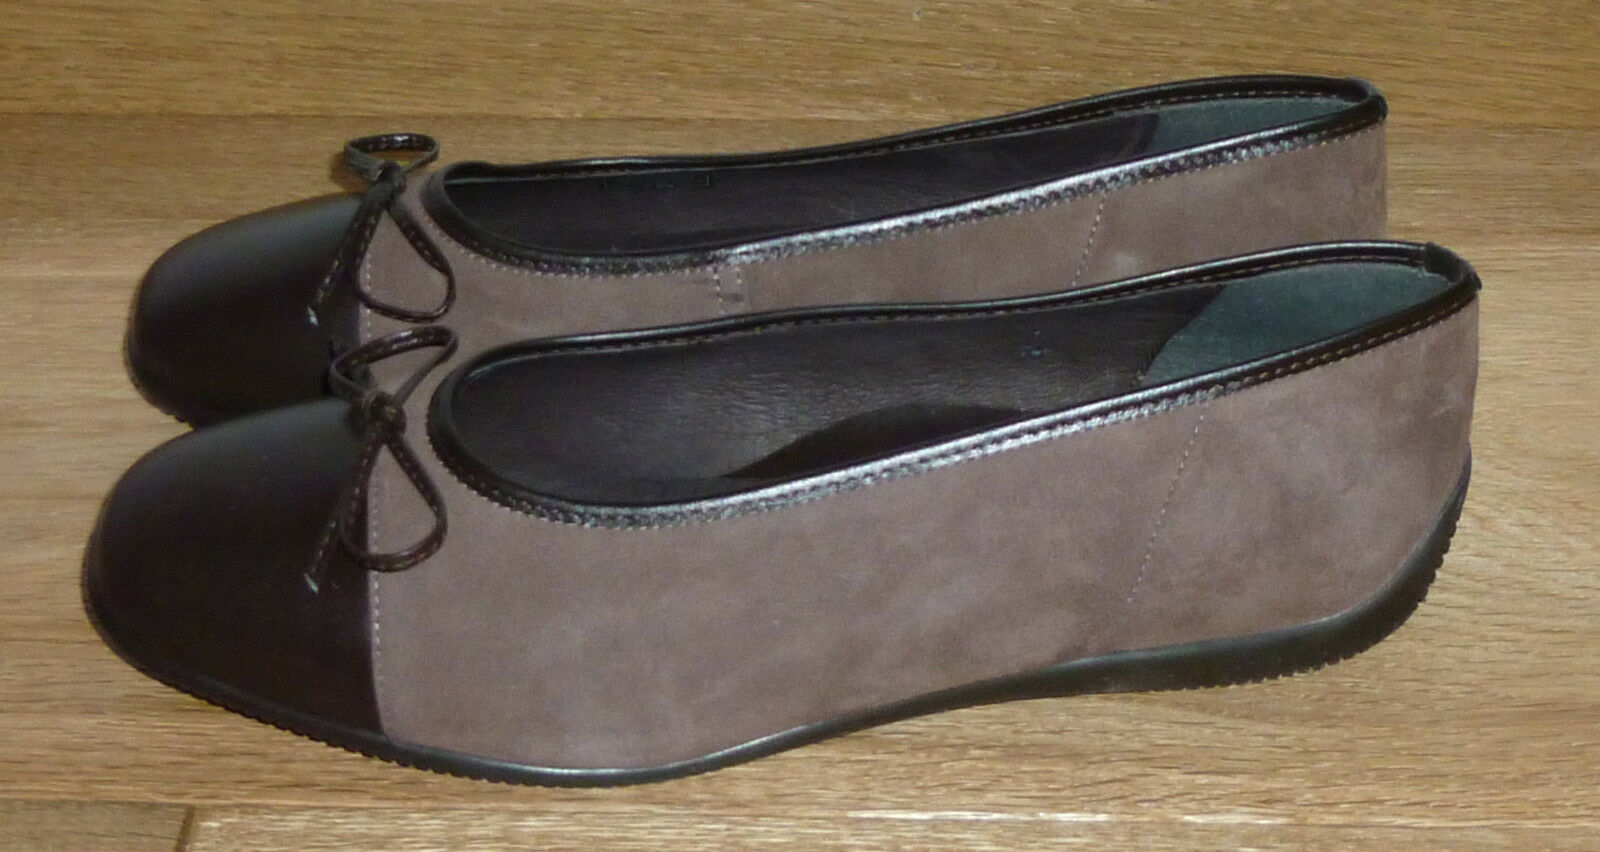 Ara Ballerines Slipper Cuir marron T 38 UK 5 US 6 Nouveau Neuf dans sa boîte